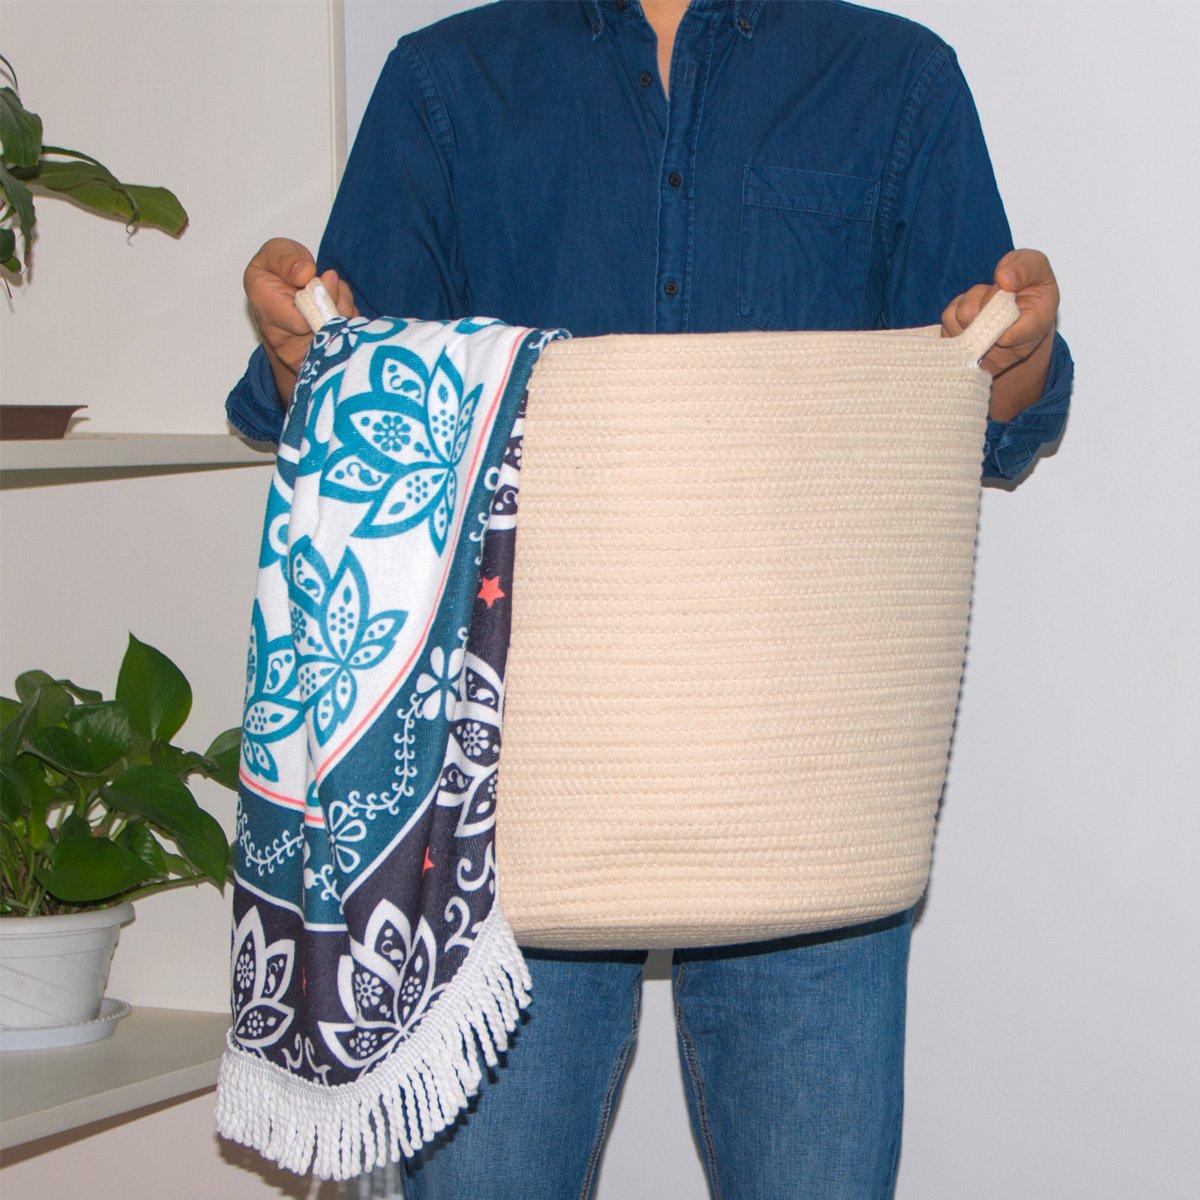 Indressme 16.0''x 15.0''x12.6'' Woven Storage Baskets - Cotton Rope Basket - Baby Nursery Basket for Toys, Towels, Blankets, Laundry Organization - Home Decor Storage Bins